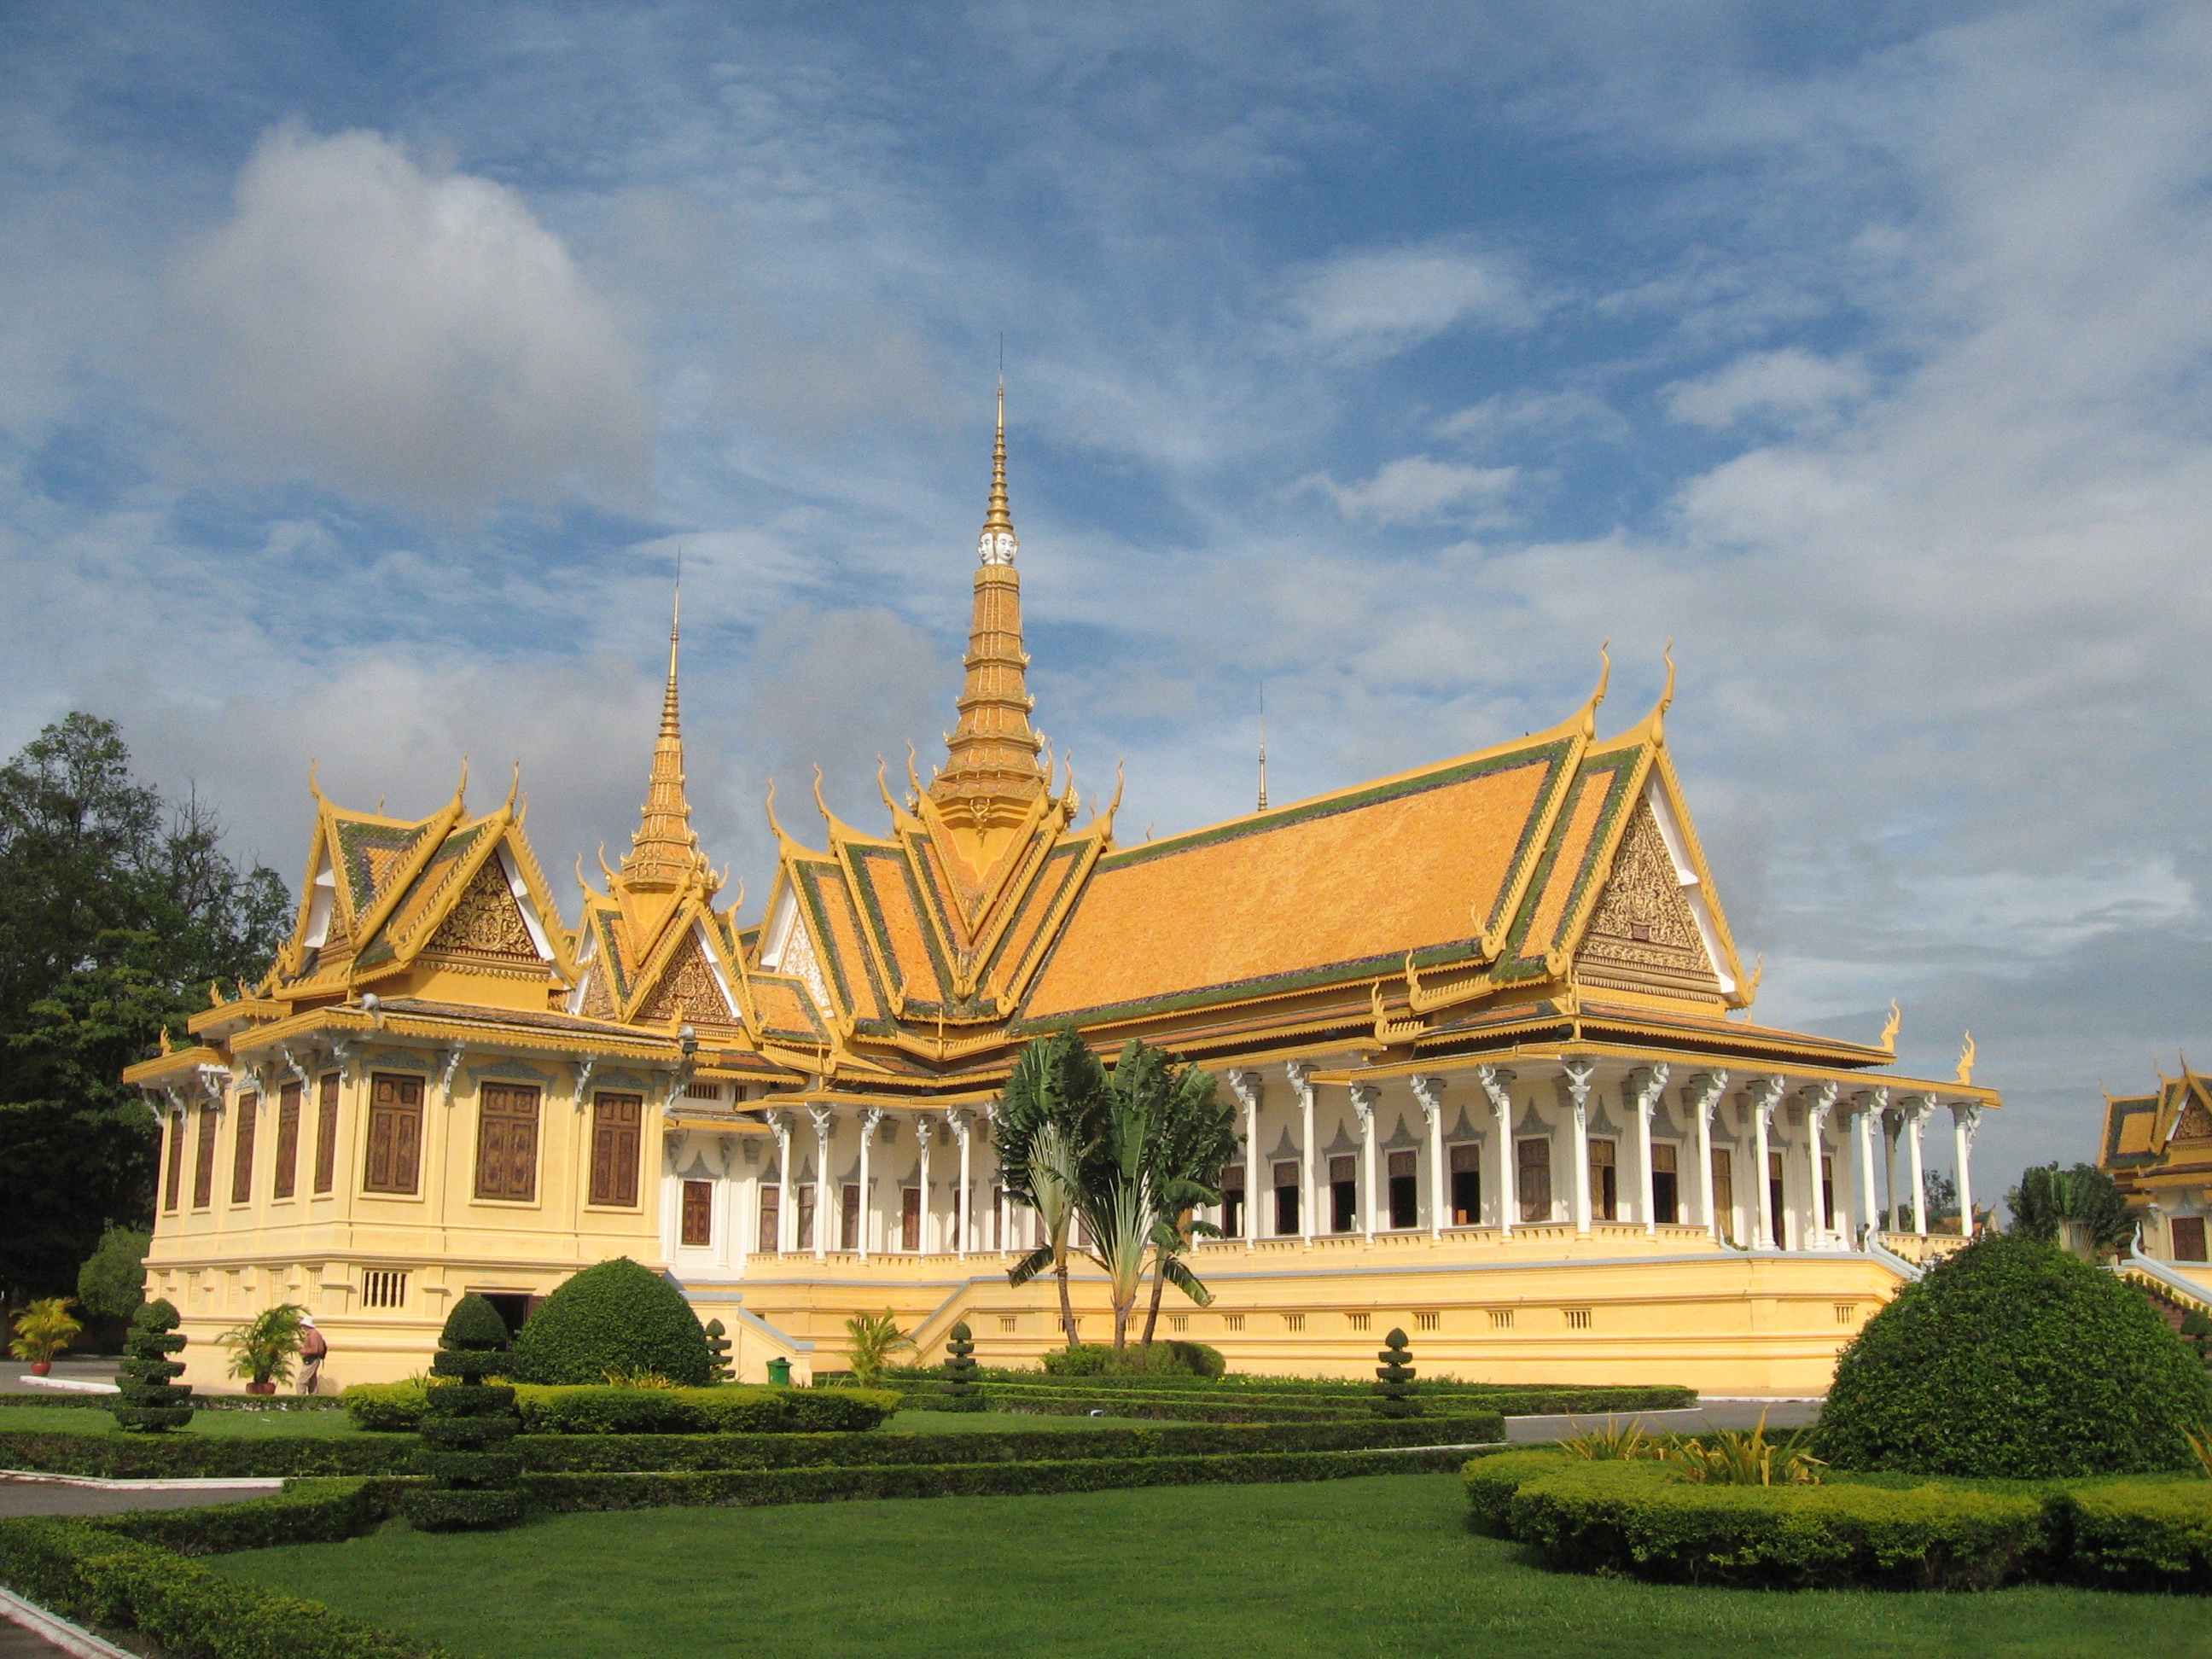 File:Throne Hall, Royal Palace, Phnom Penh, Cambodia.jpg ...